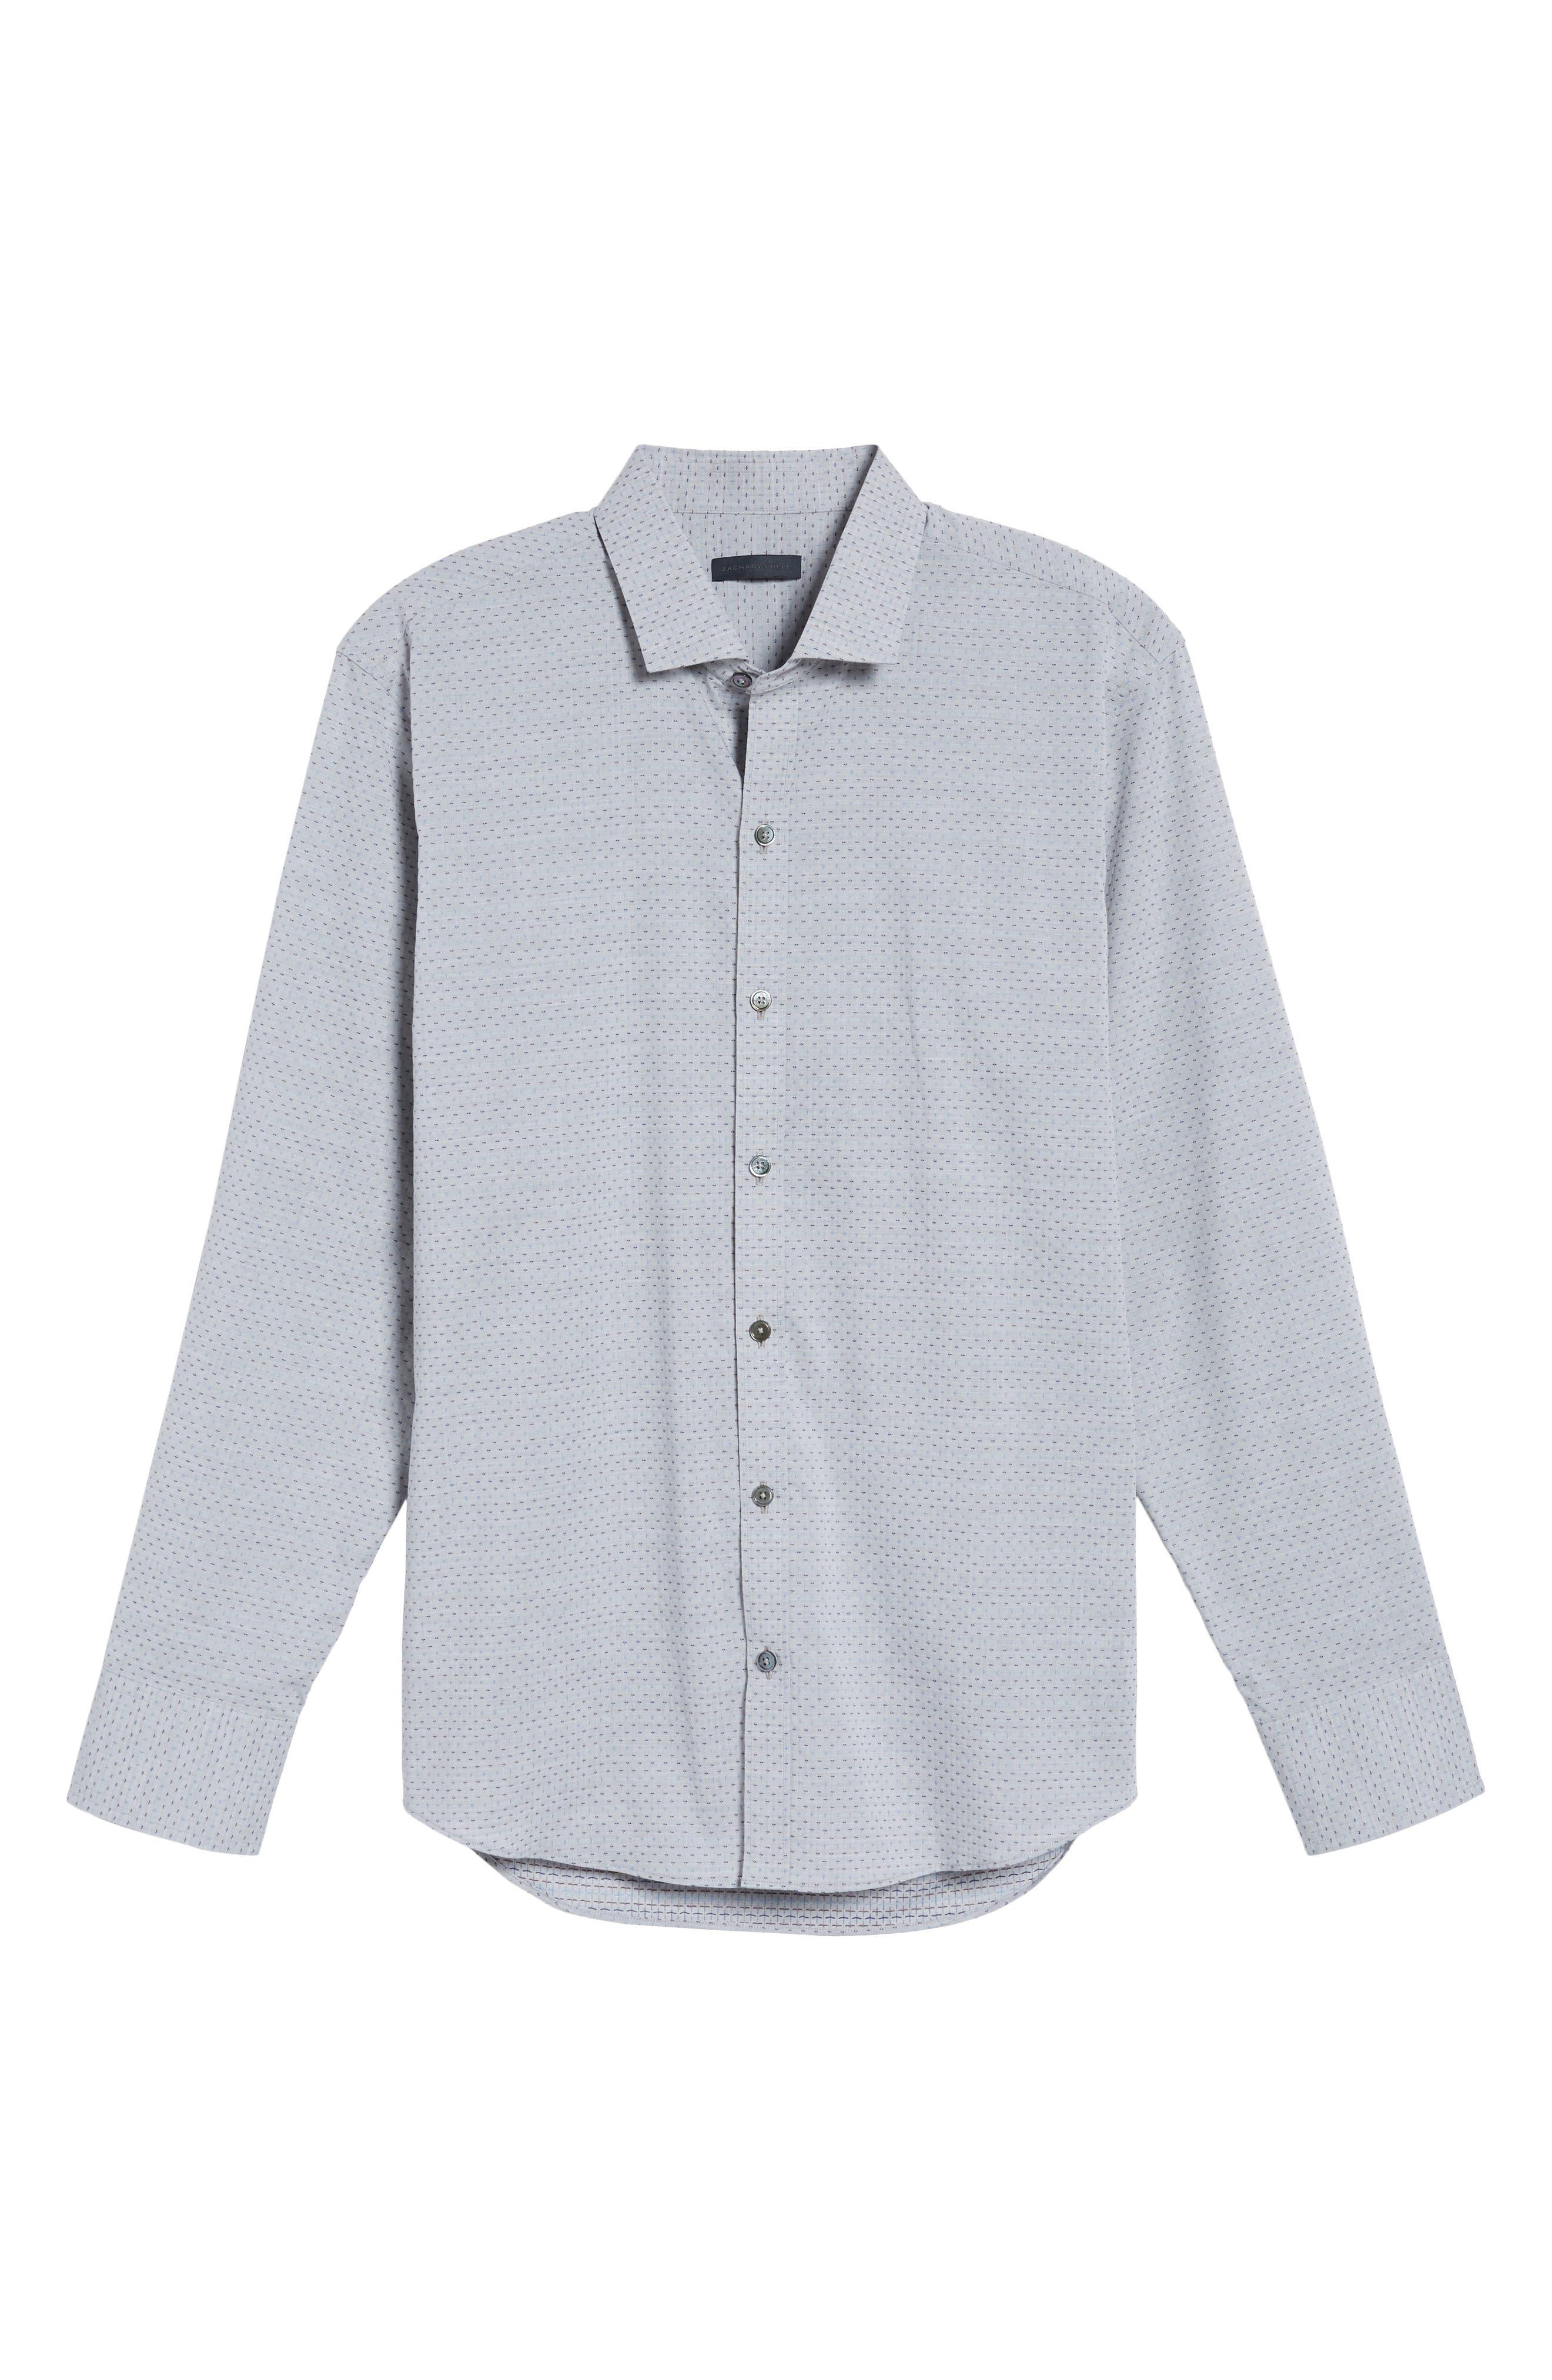 Atila Slim Fit Dobby Woven Sport Shirt,                             Alternate thumbnail 6, color,                             Light Grey